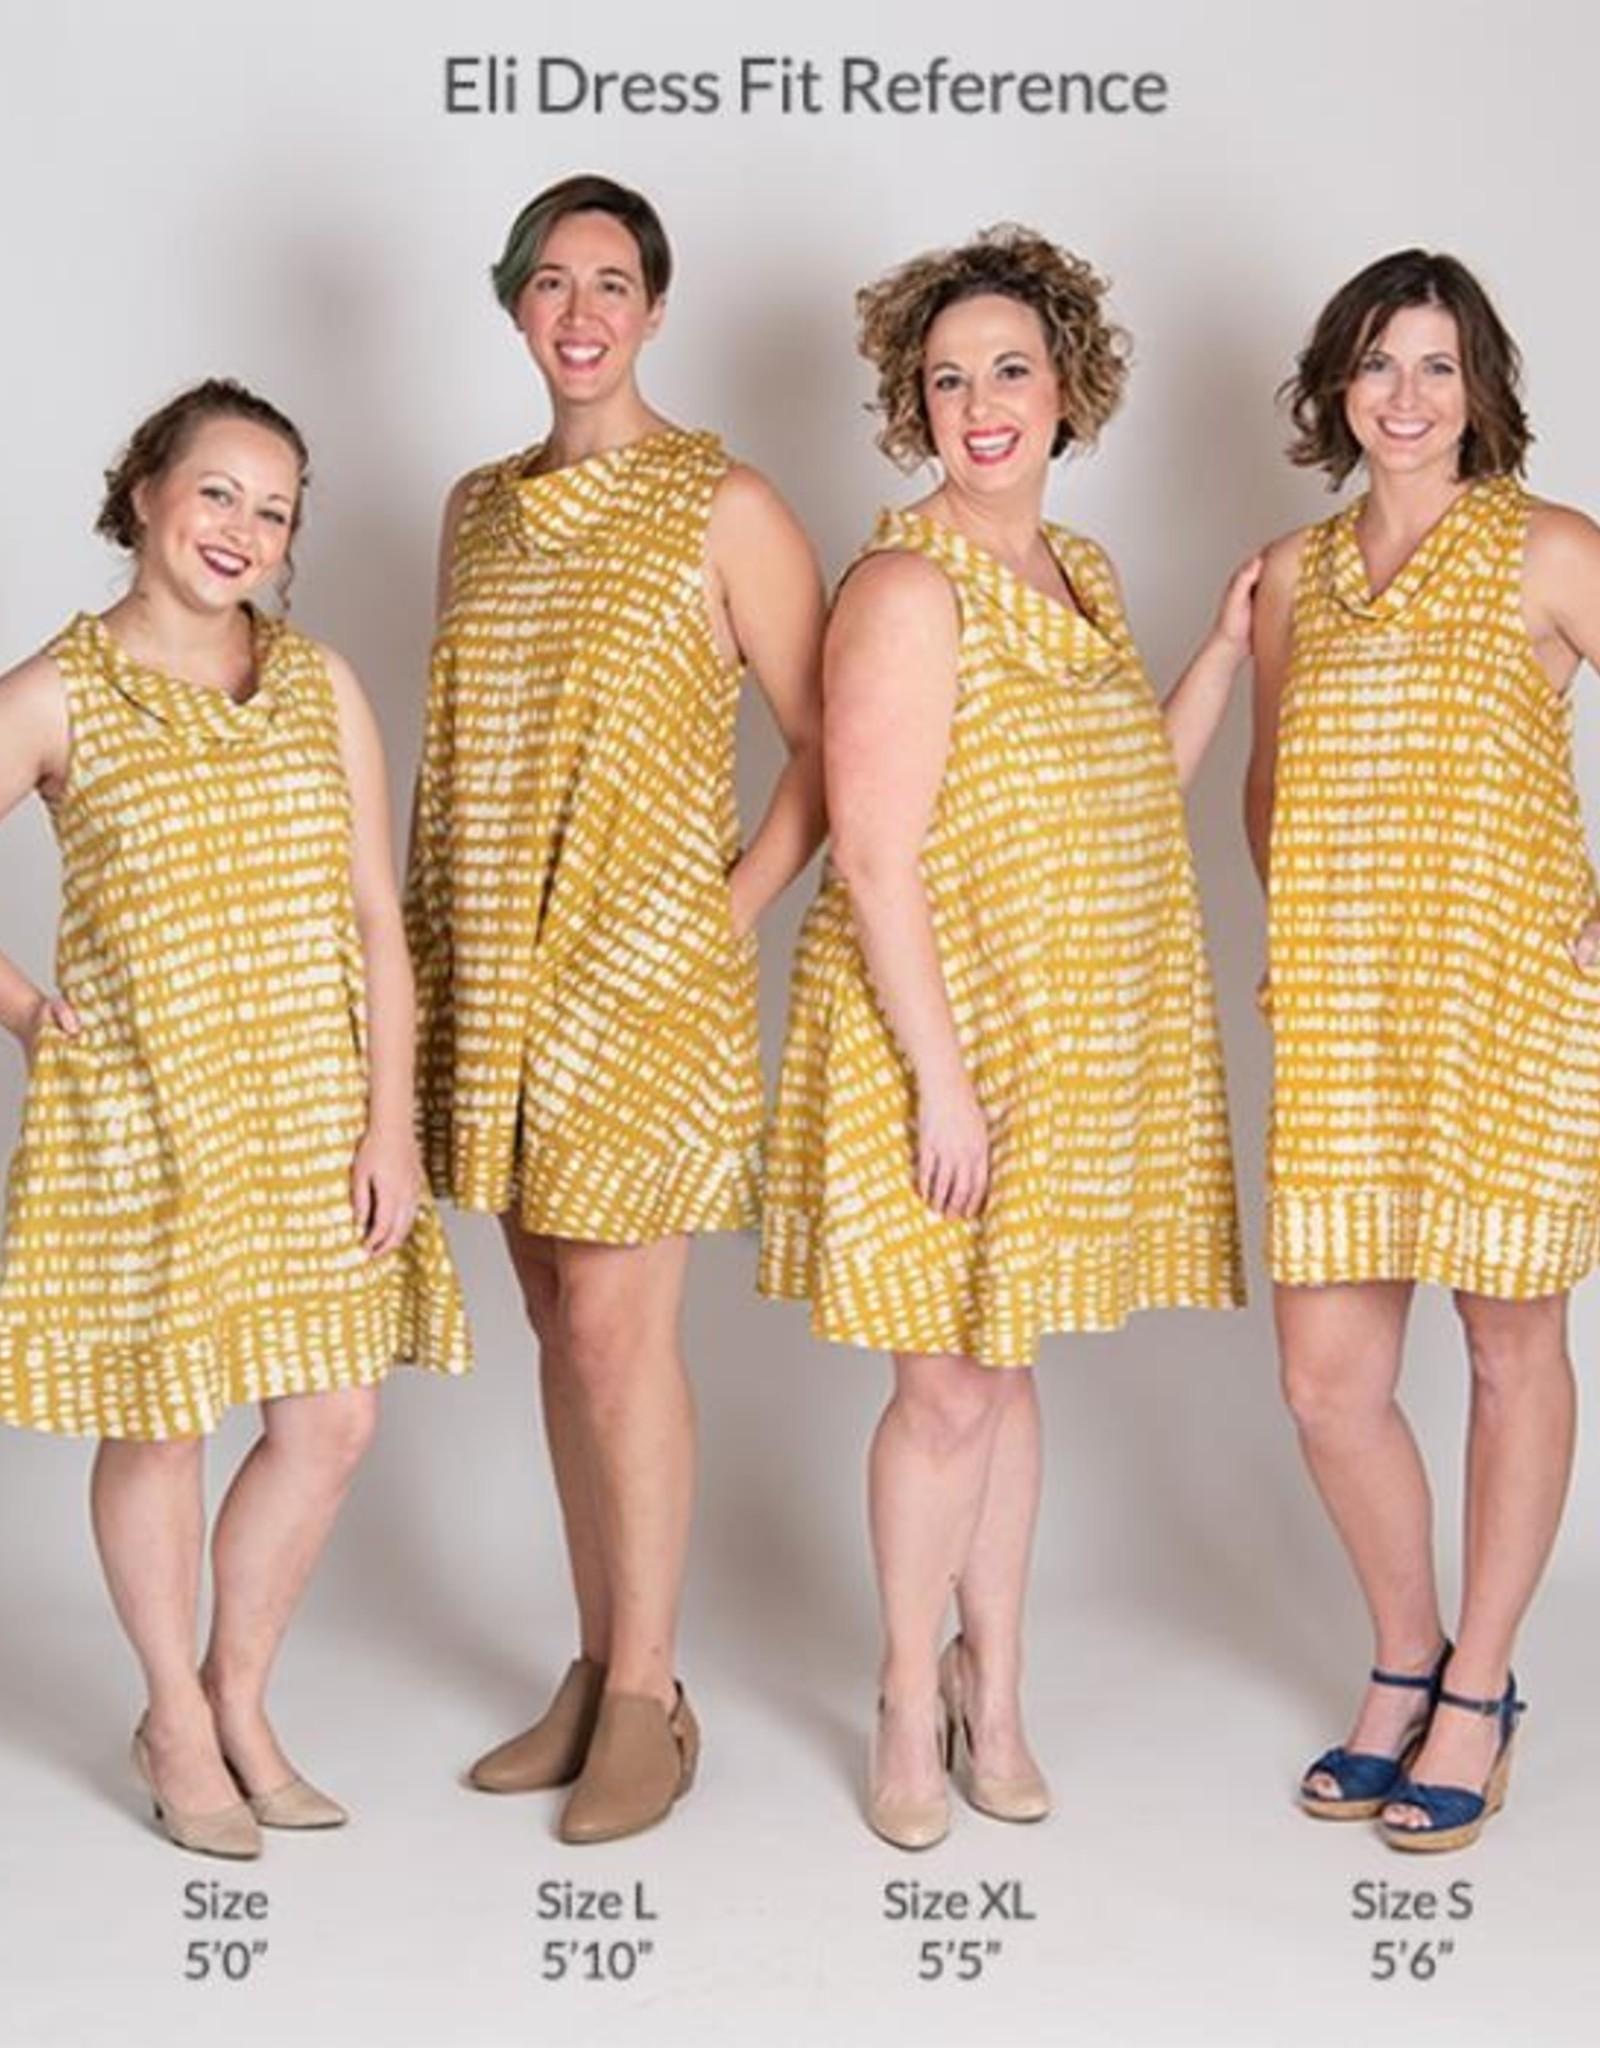 Global Mamas Organic Eli Dress